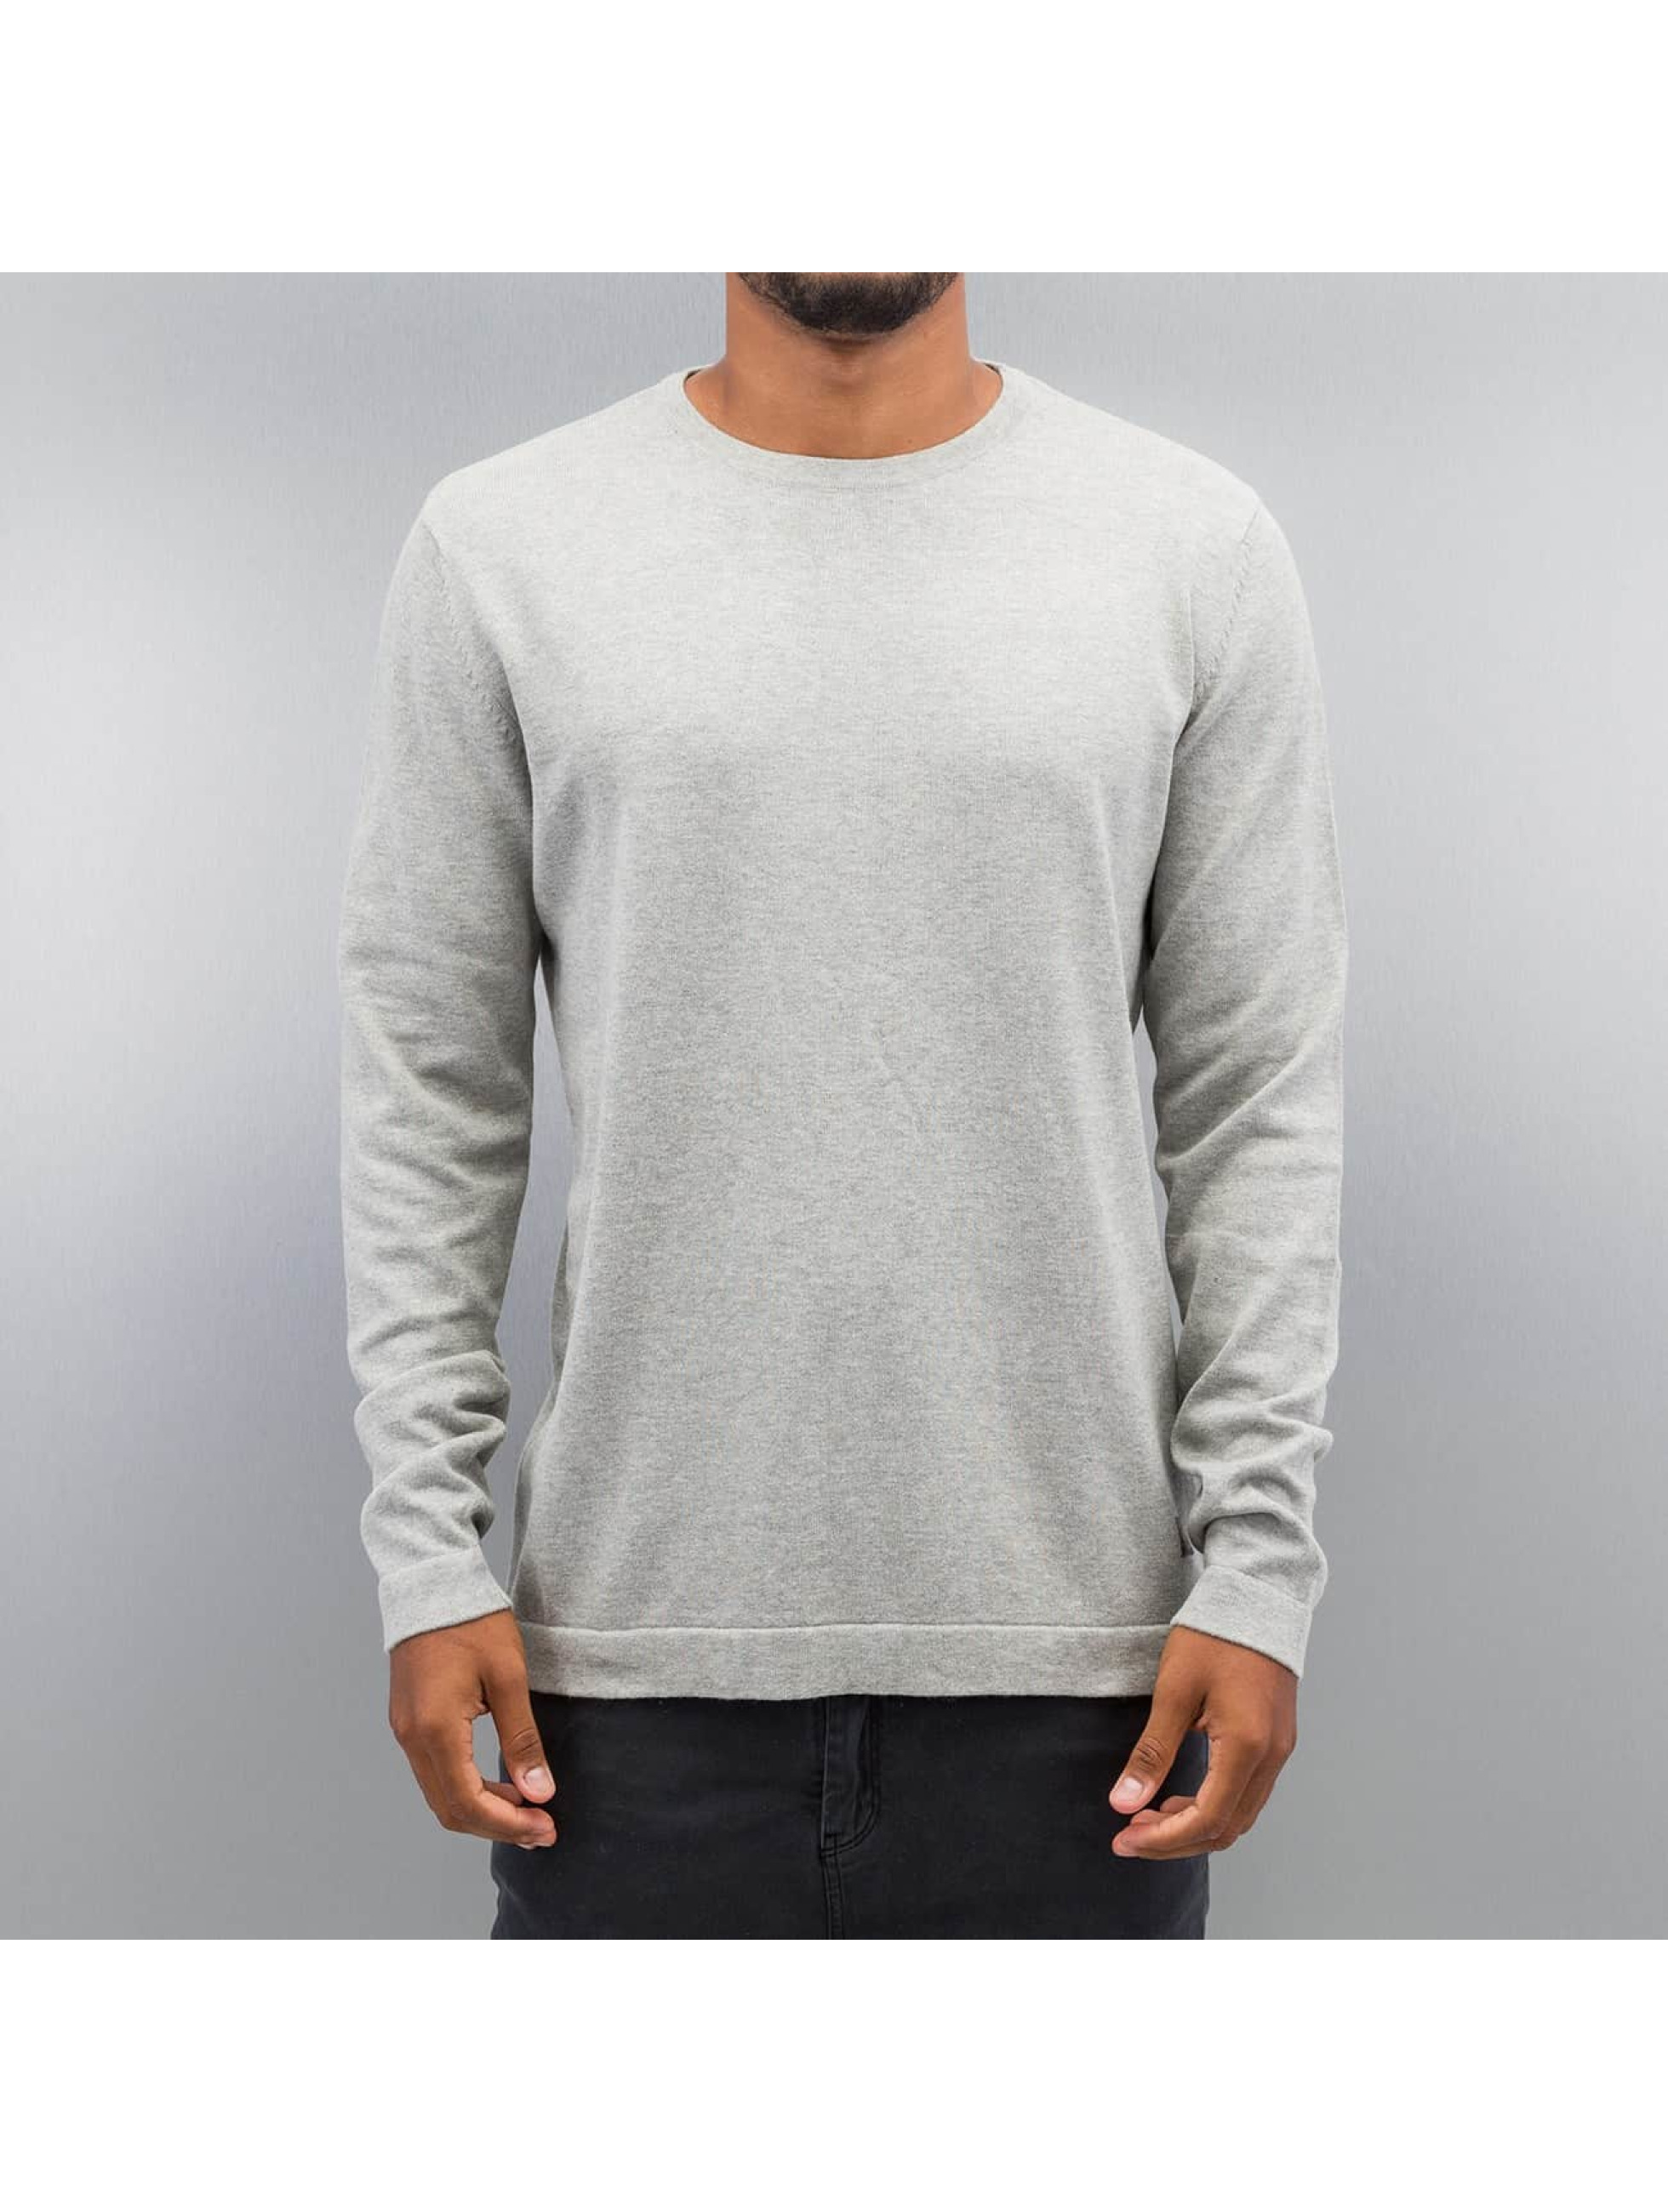 Jack & Jones Pullover corBasic gray